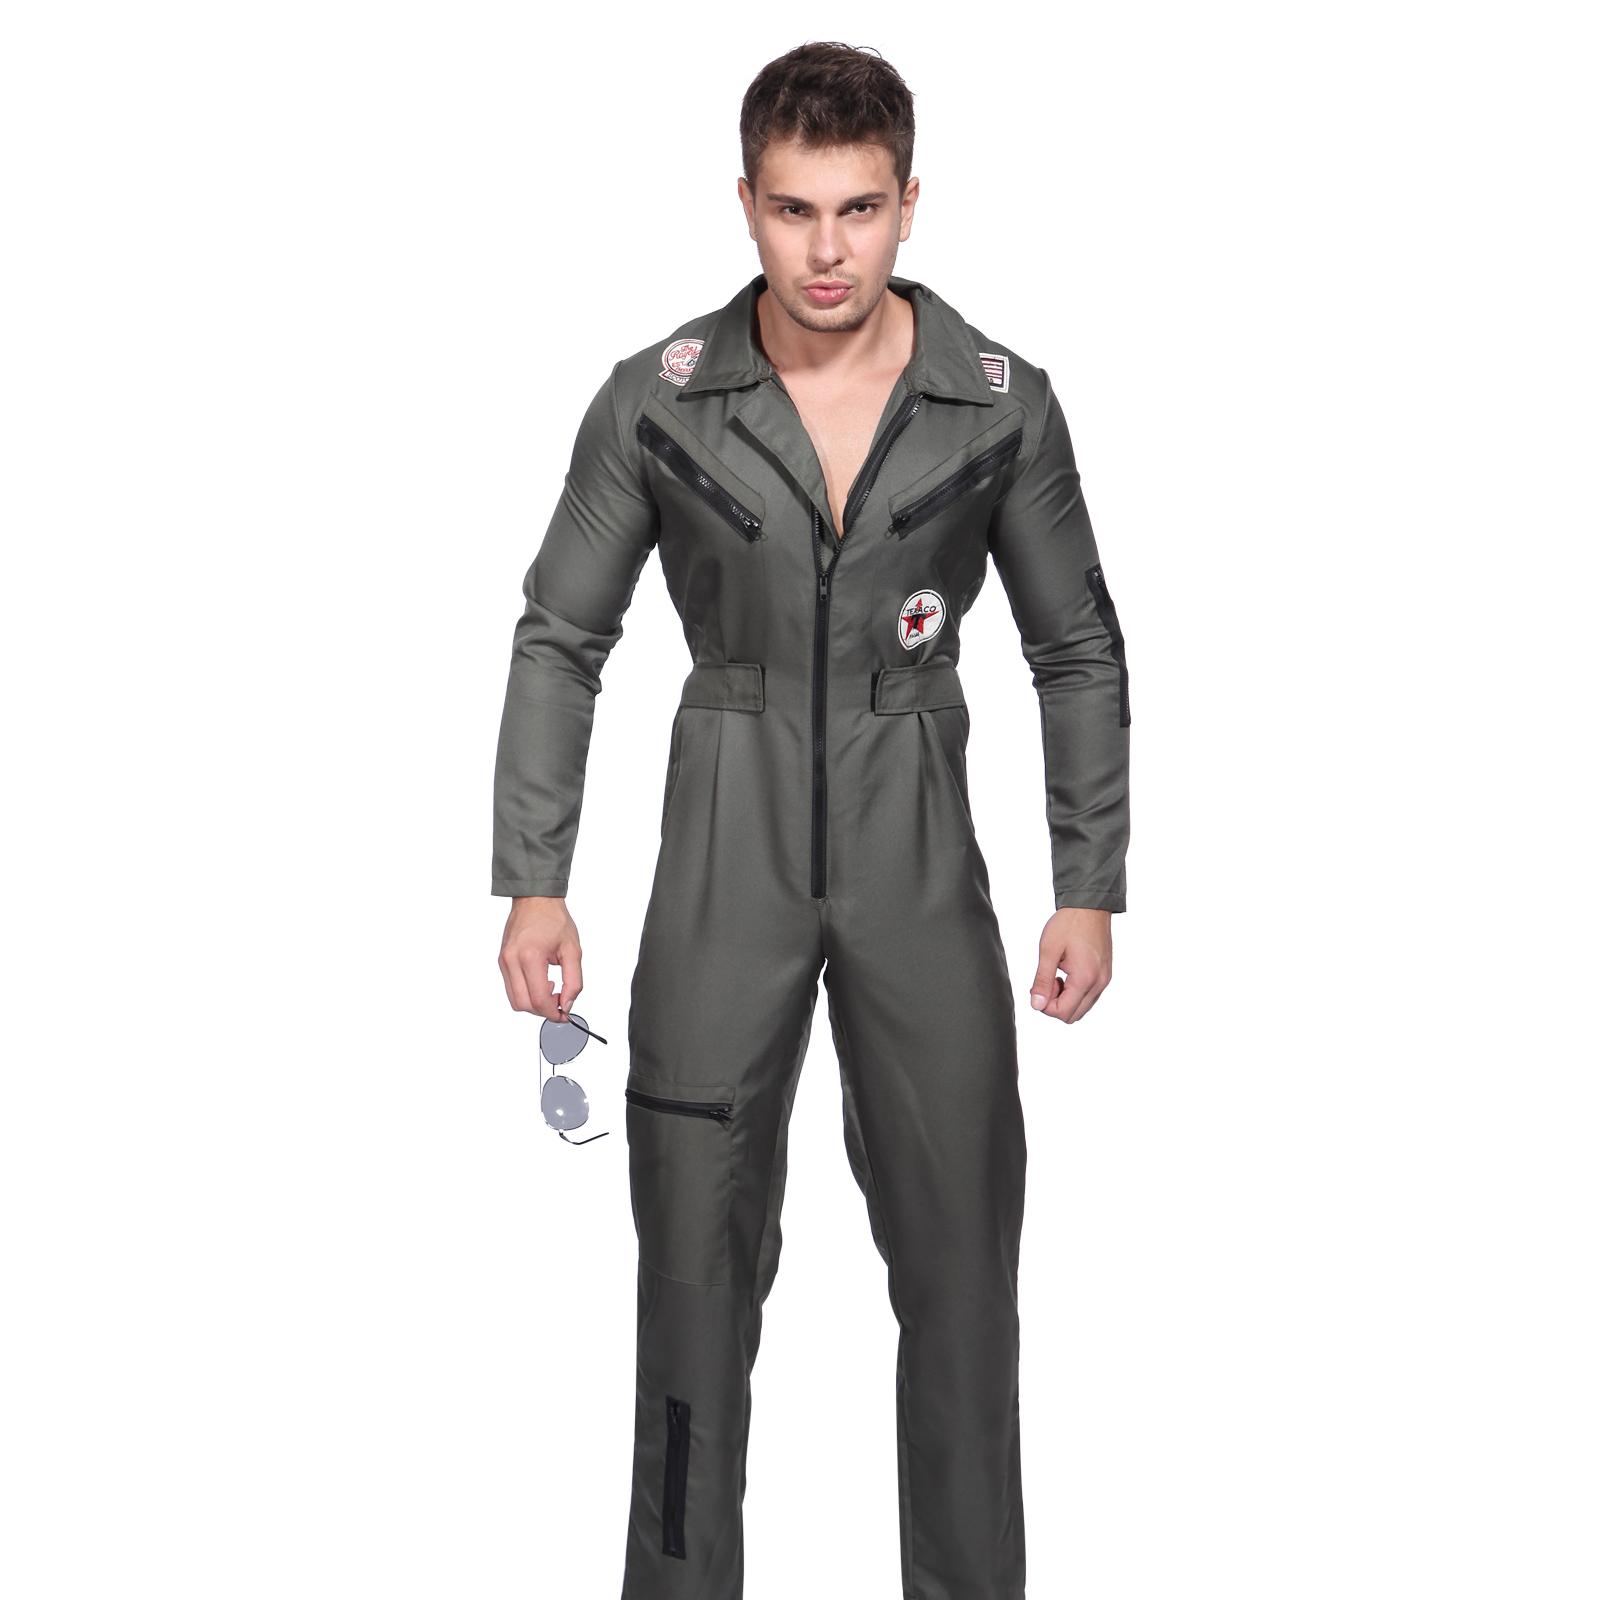 Aviator Uniform 92